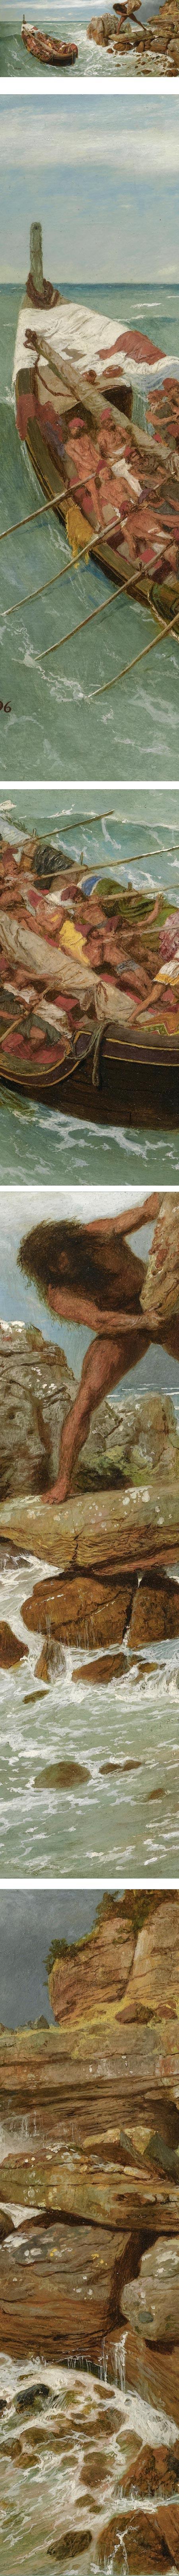 Odysseus and Polyphemus, Arnold Bocklin